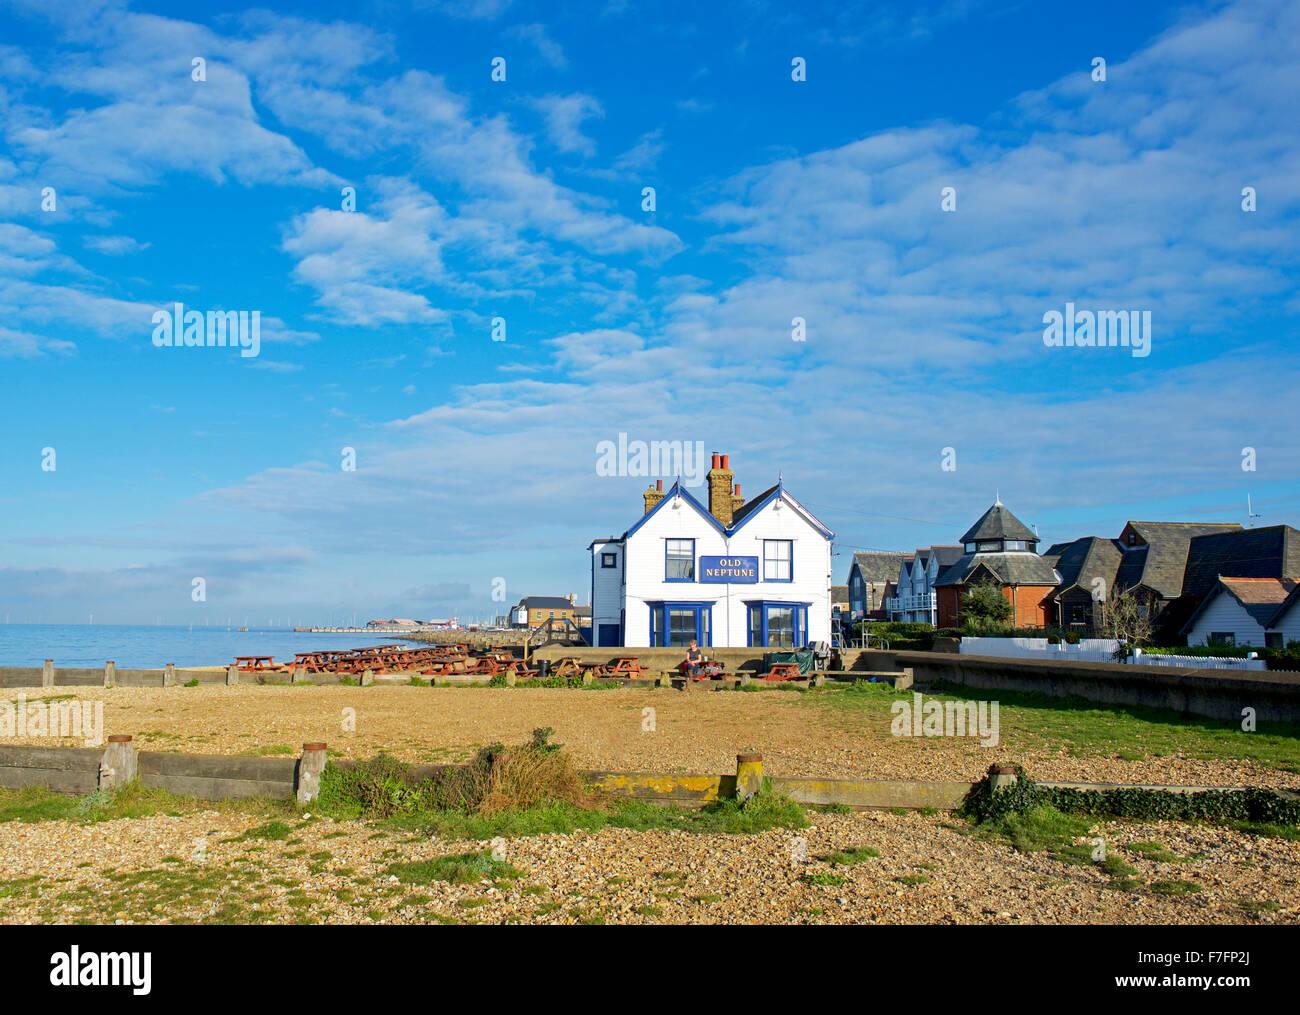 The Old Neptune pub, Marine Terrace, Whitstable Kent, England UK Stock Photo